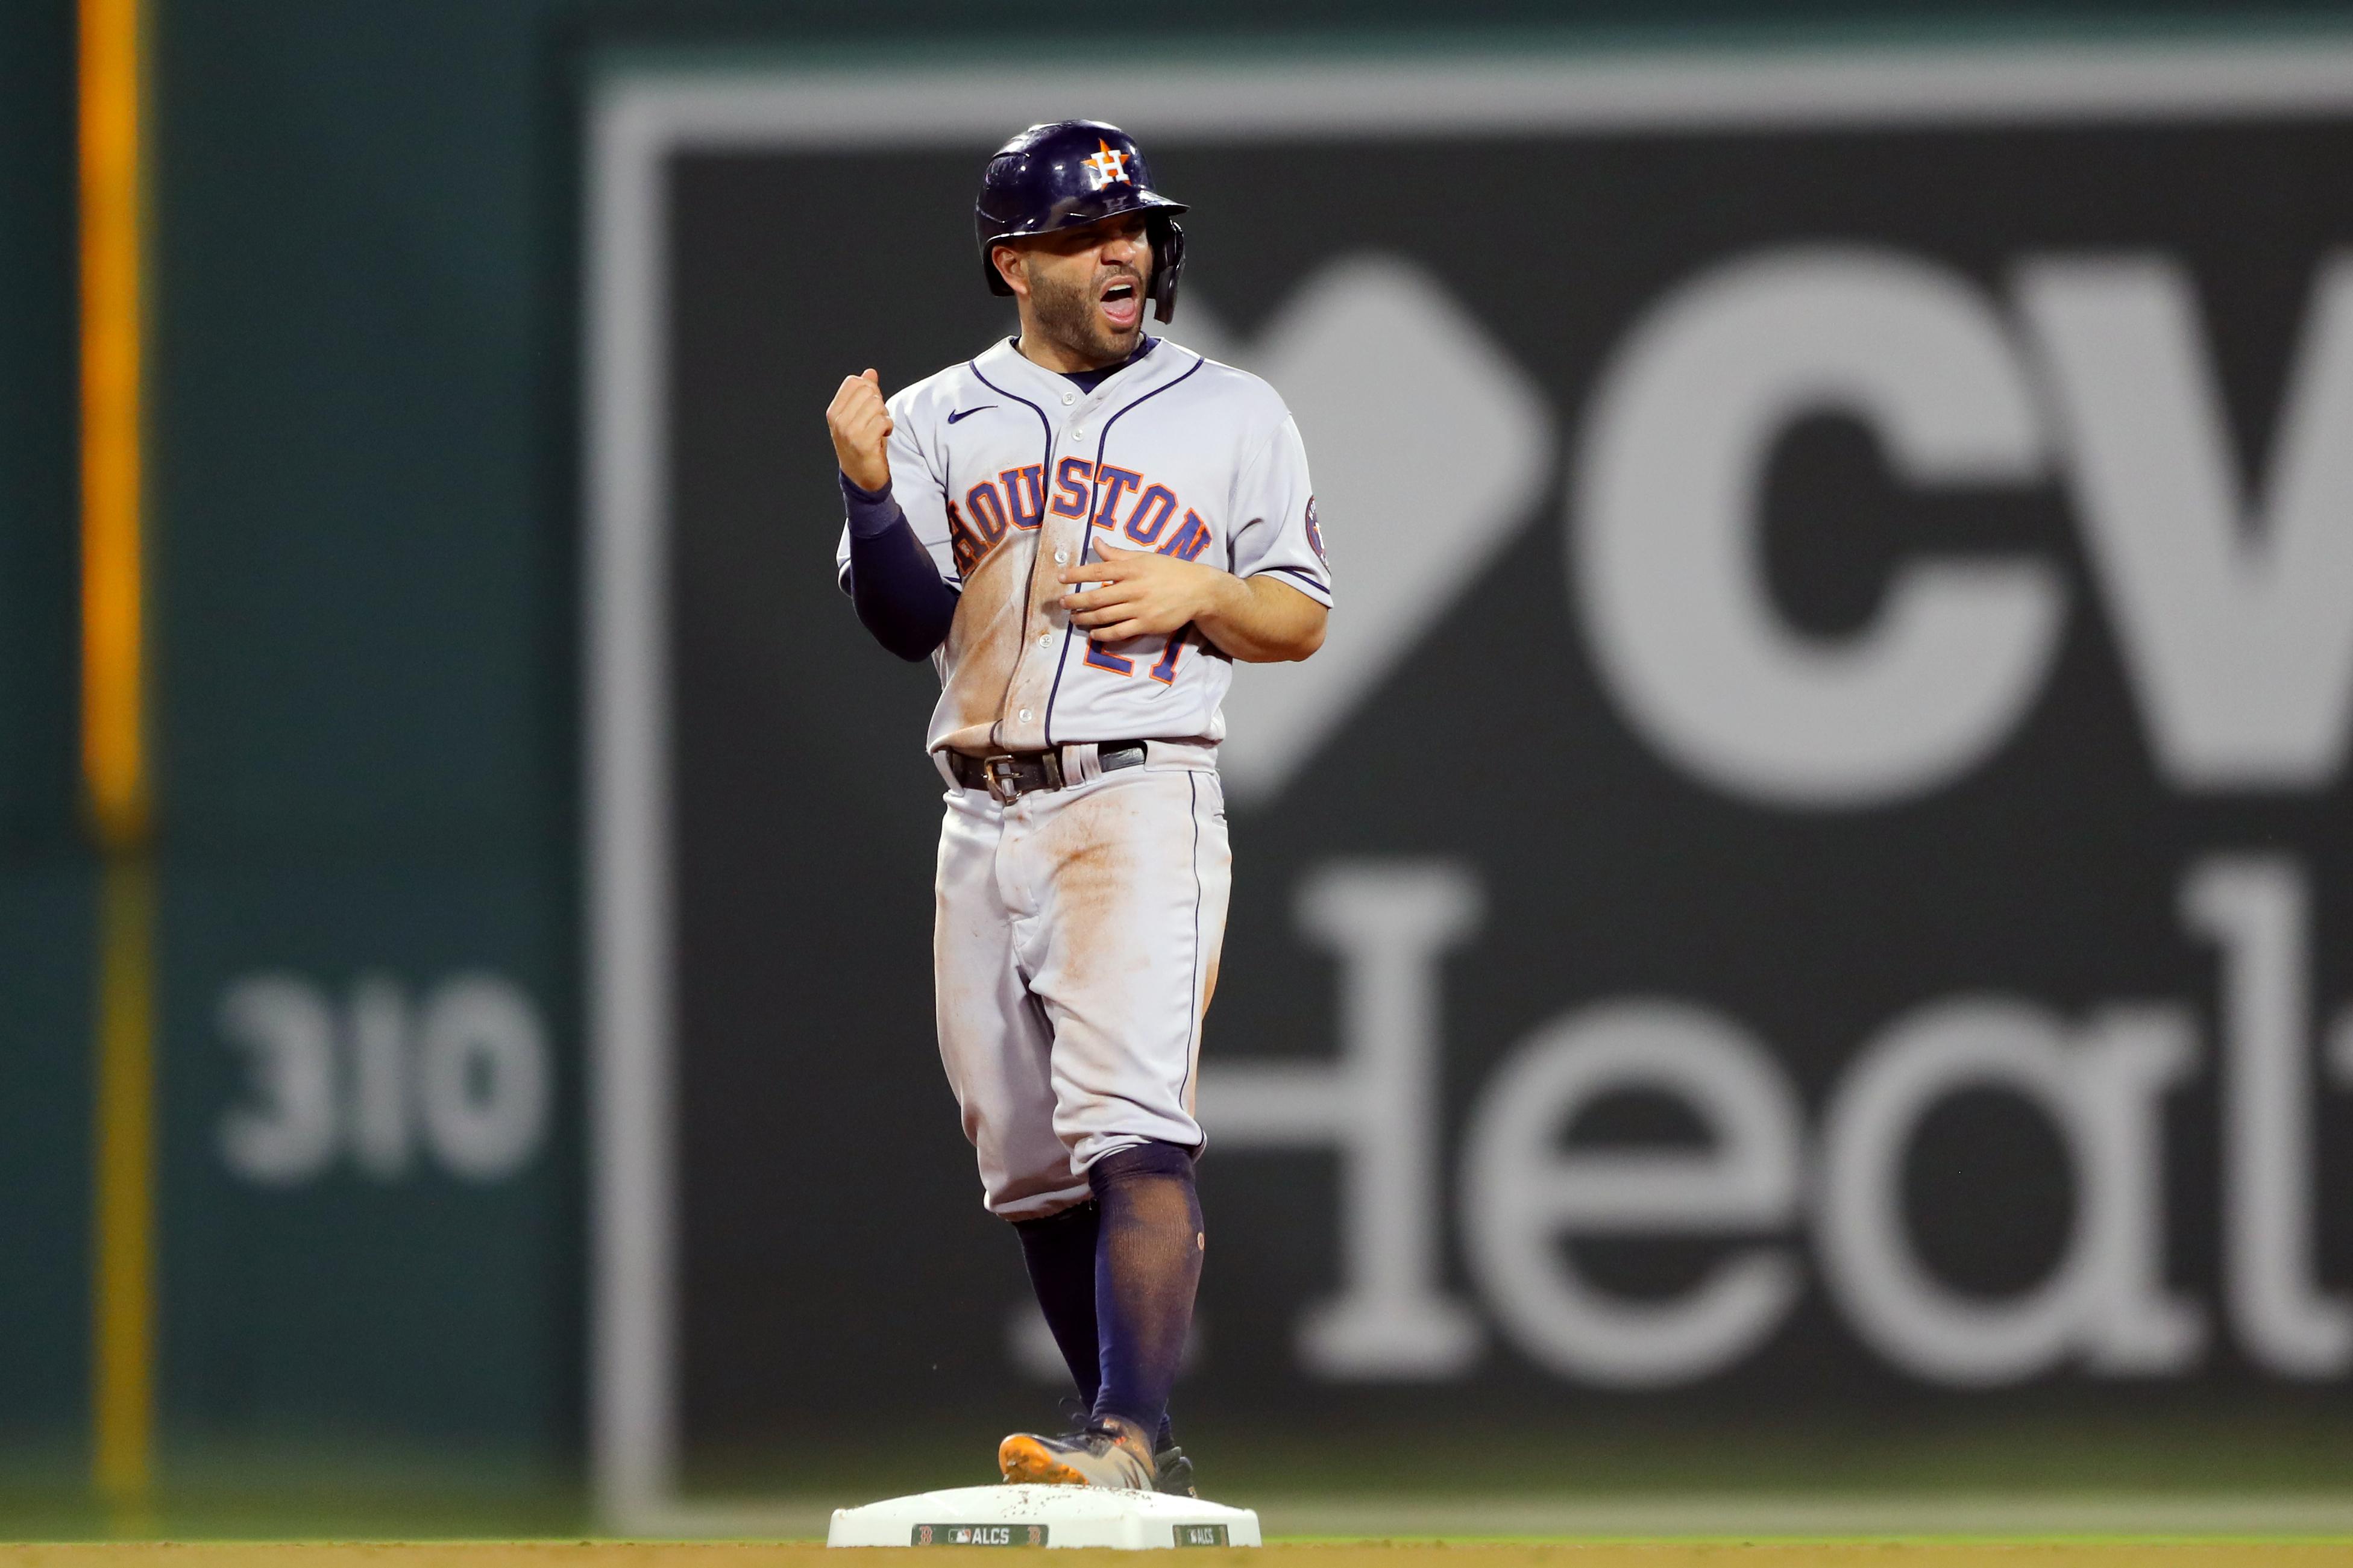 American League Championship Series Game 5: Houston Astros v. Boston Red Sox